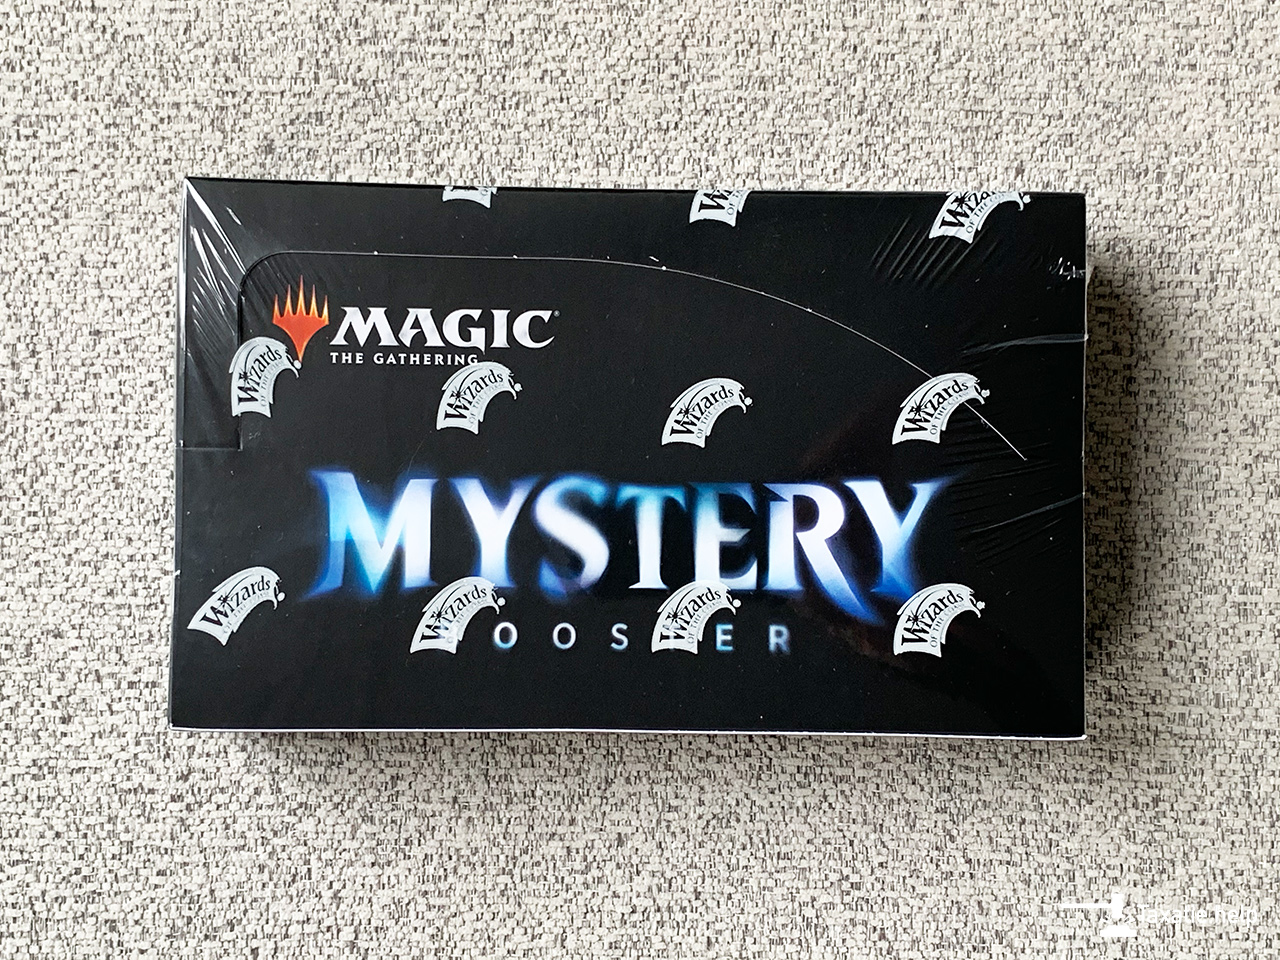 Magic the Gathering MTG booster box